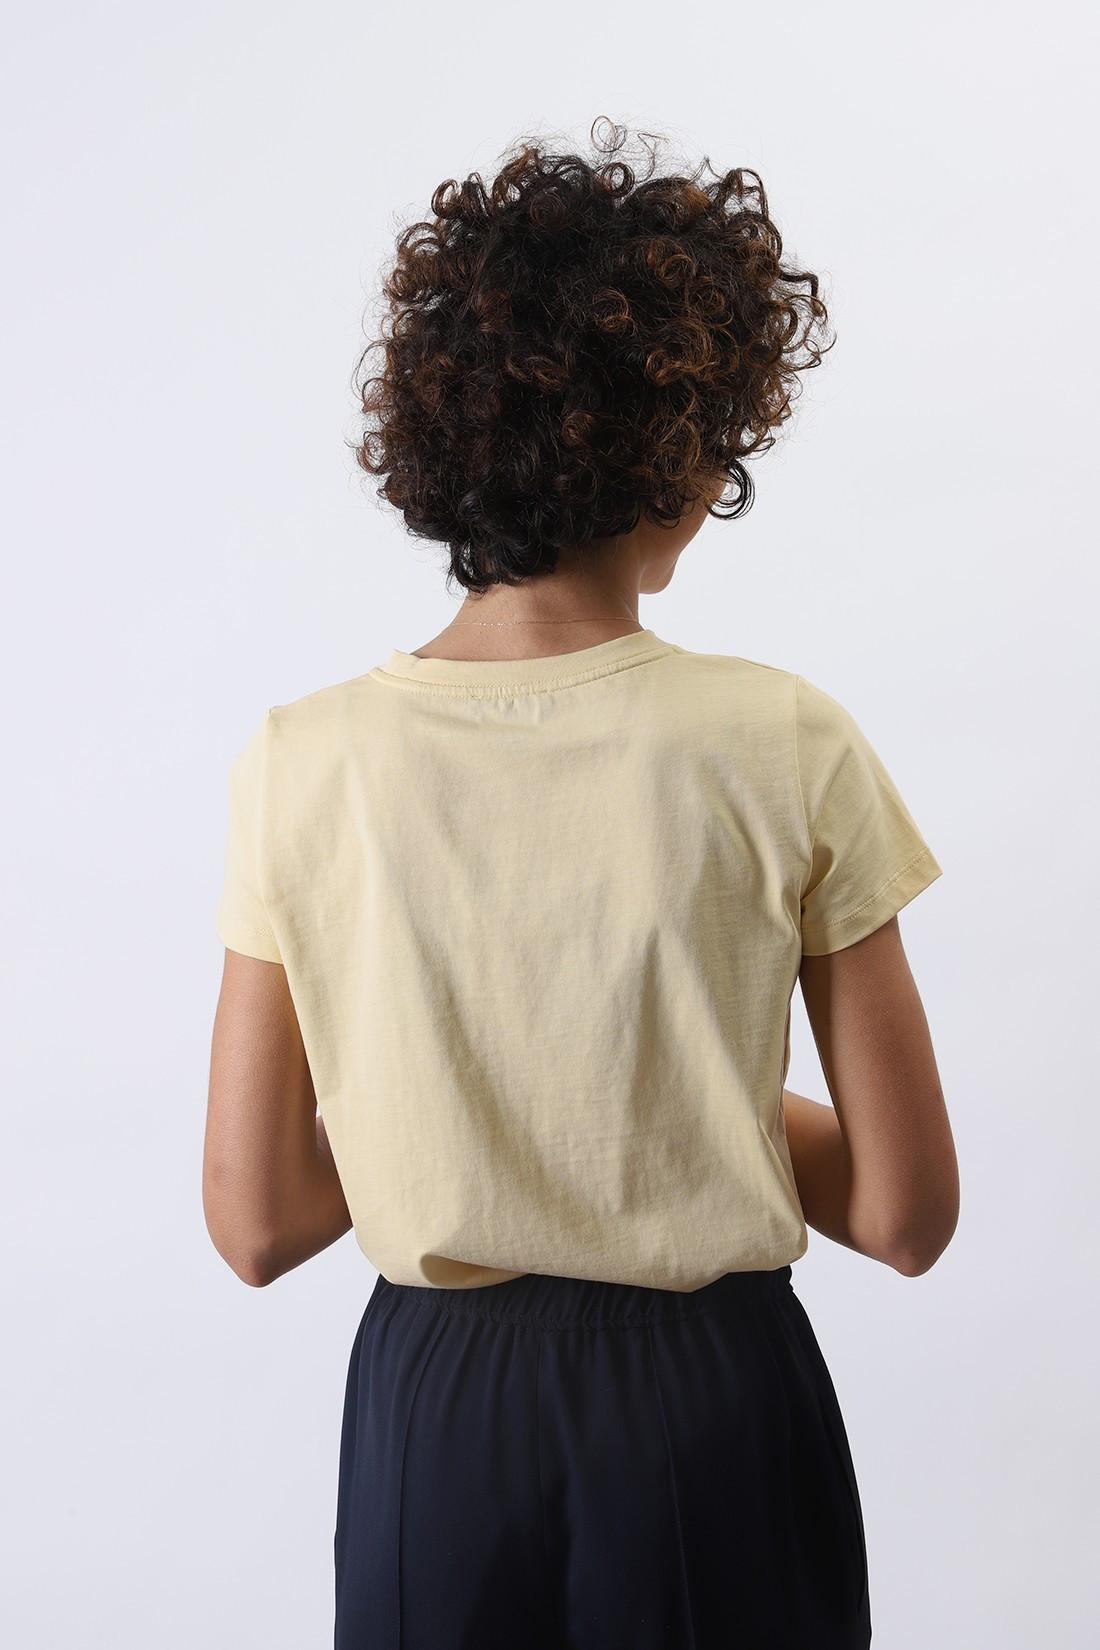 A.P.C. FOR WOMAN / T-shirt item Jaune